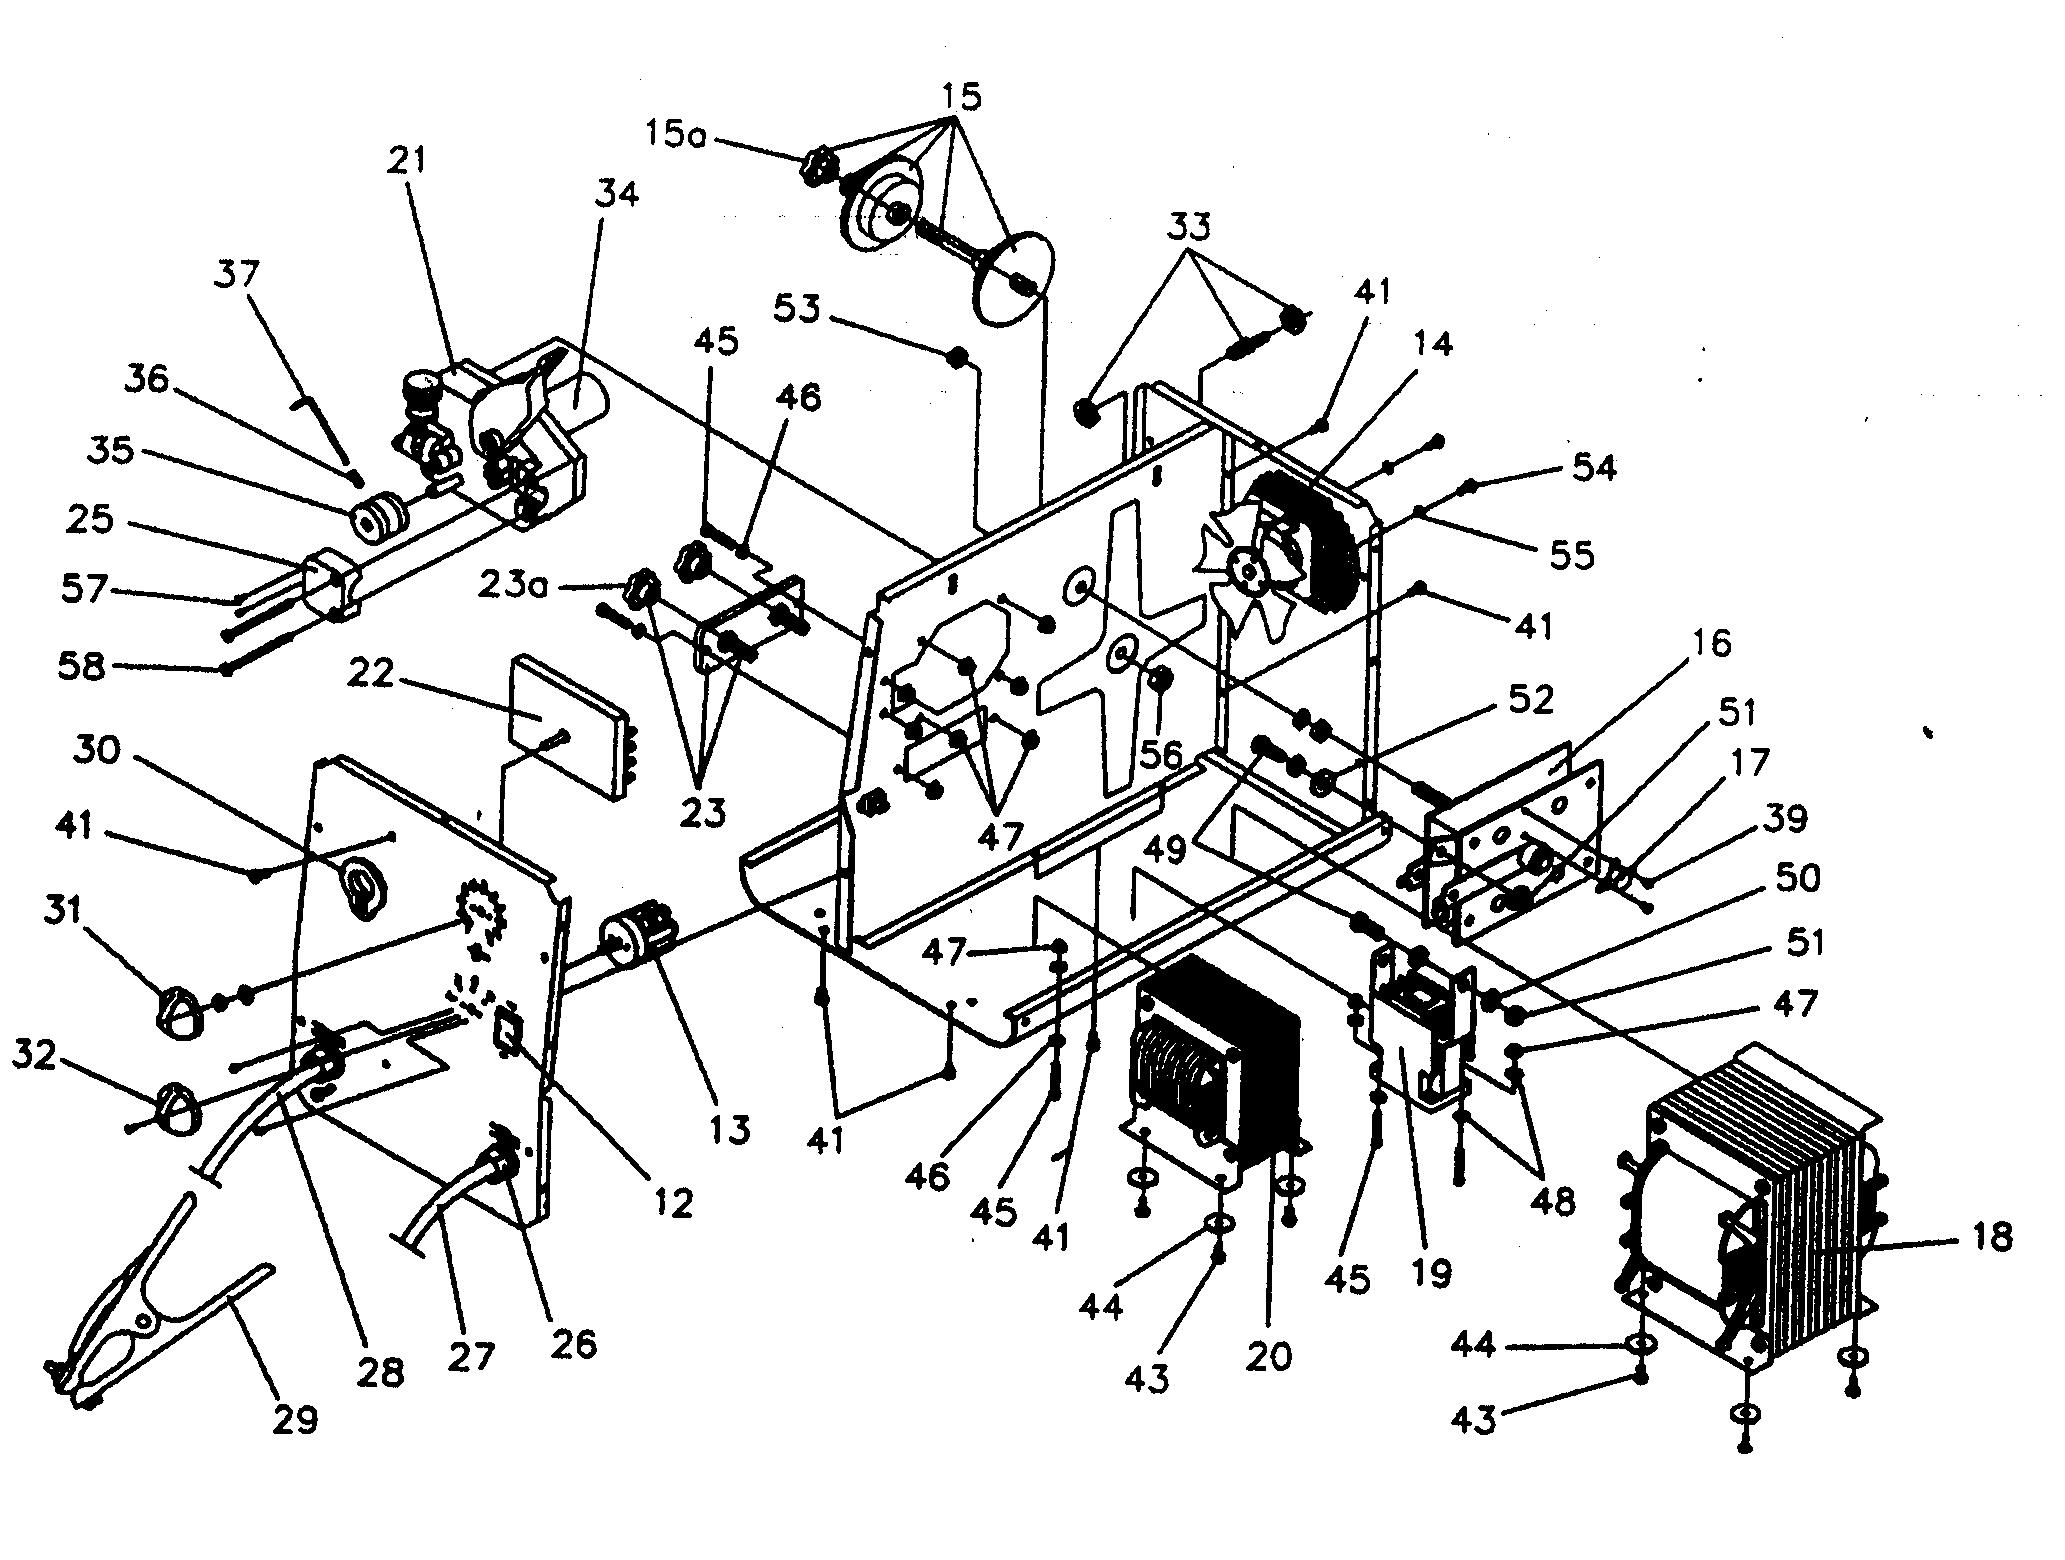 Fine craftsman mig welder frieze electrical diagram ideas